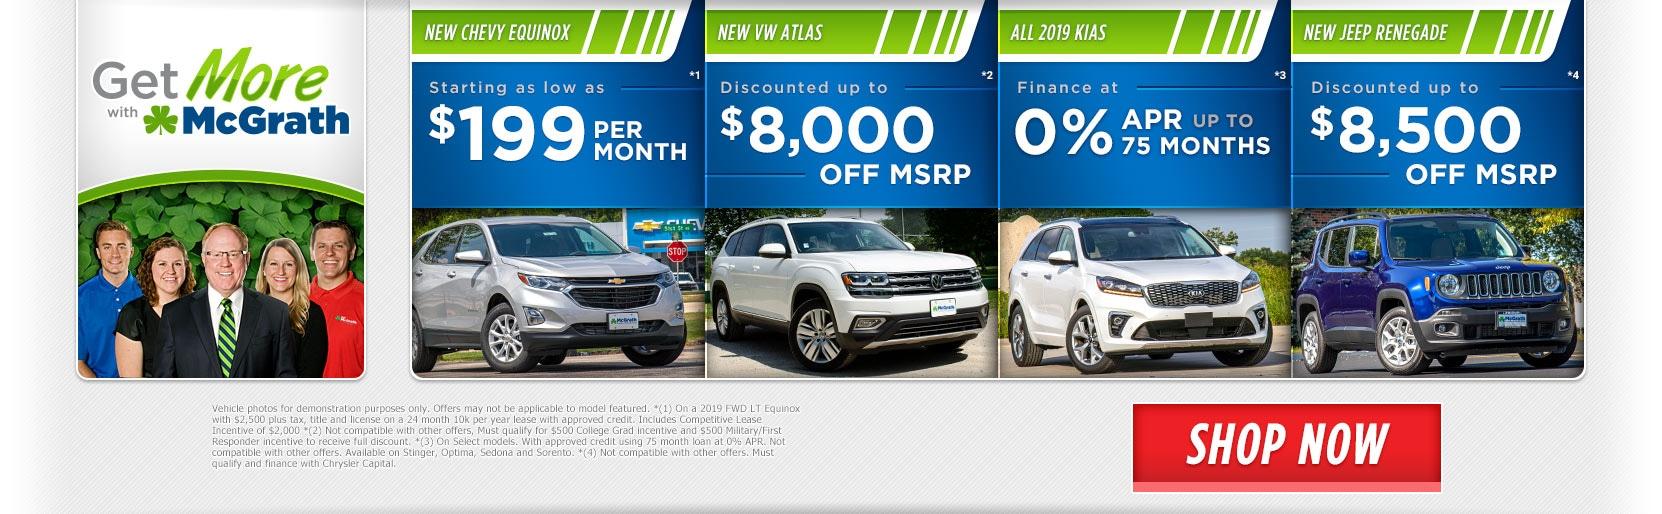 Cedar Falls Car Dealerships >> Used Car Dealer New Chevy Ram Kia Jeep Gmc Vw Hyundai Buick